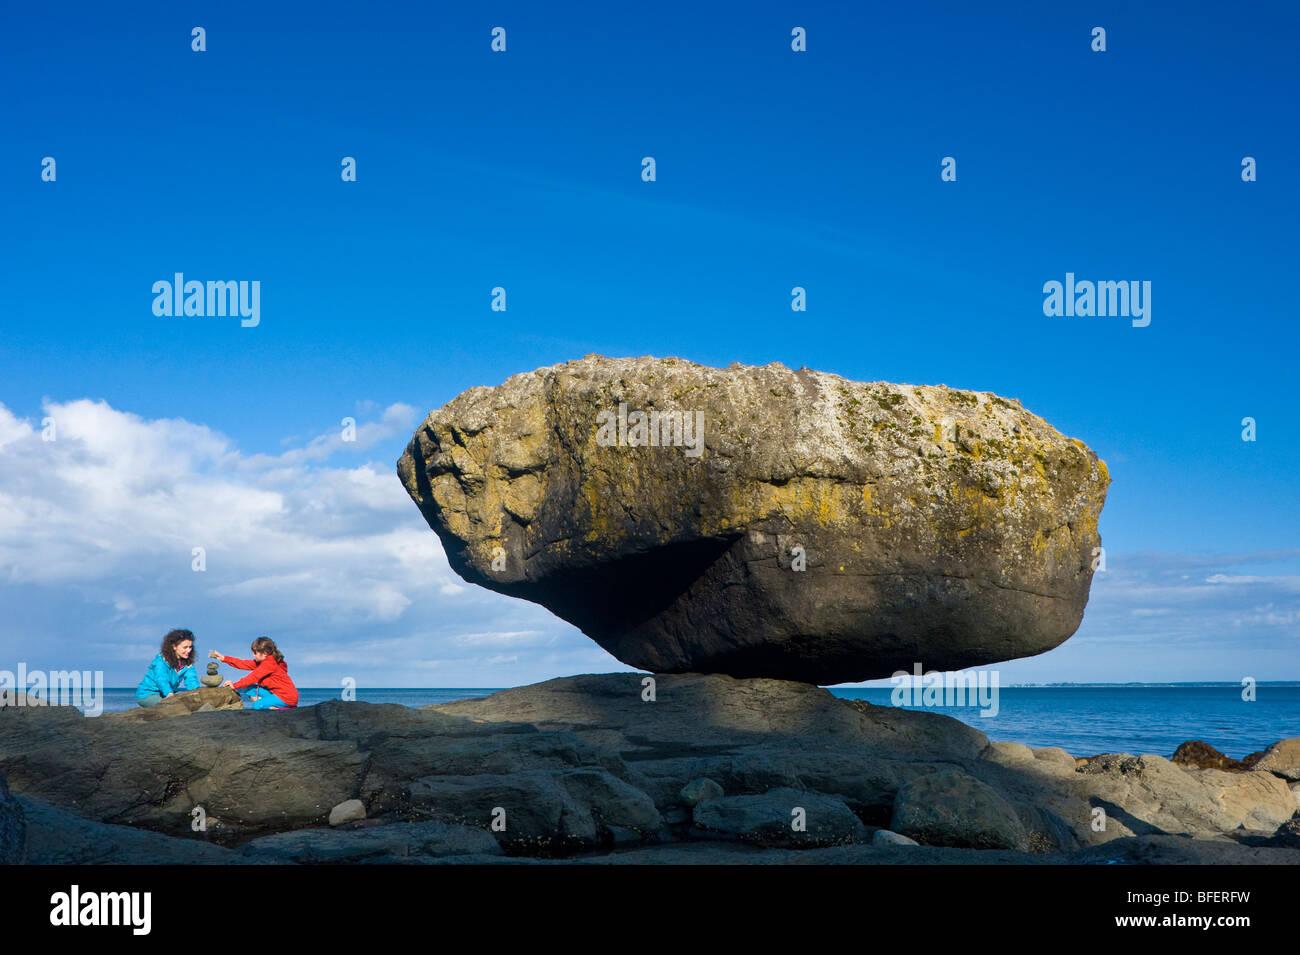 Balance Rock, Graham Island, Queen Charlotte Islands, British Columbia, Canada - Stock Image